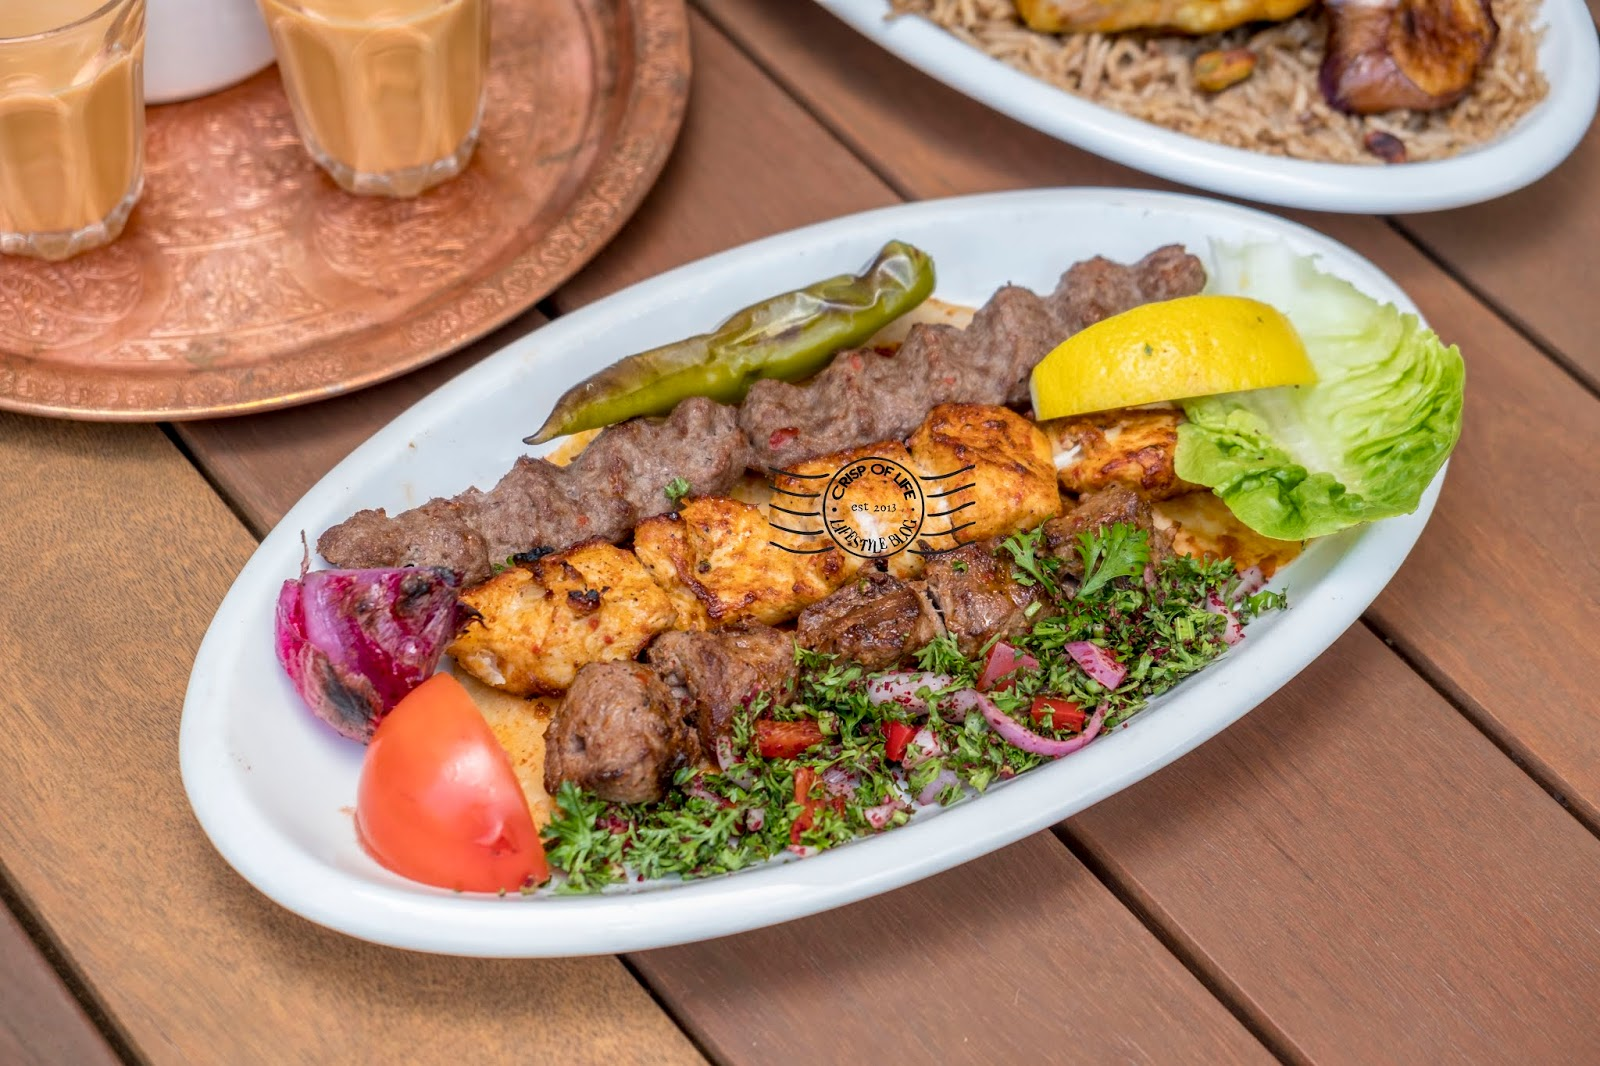 Middle East Cuisine @ Halab, Chulia Street, Georgetown, Penang